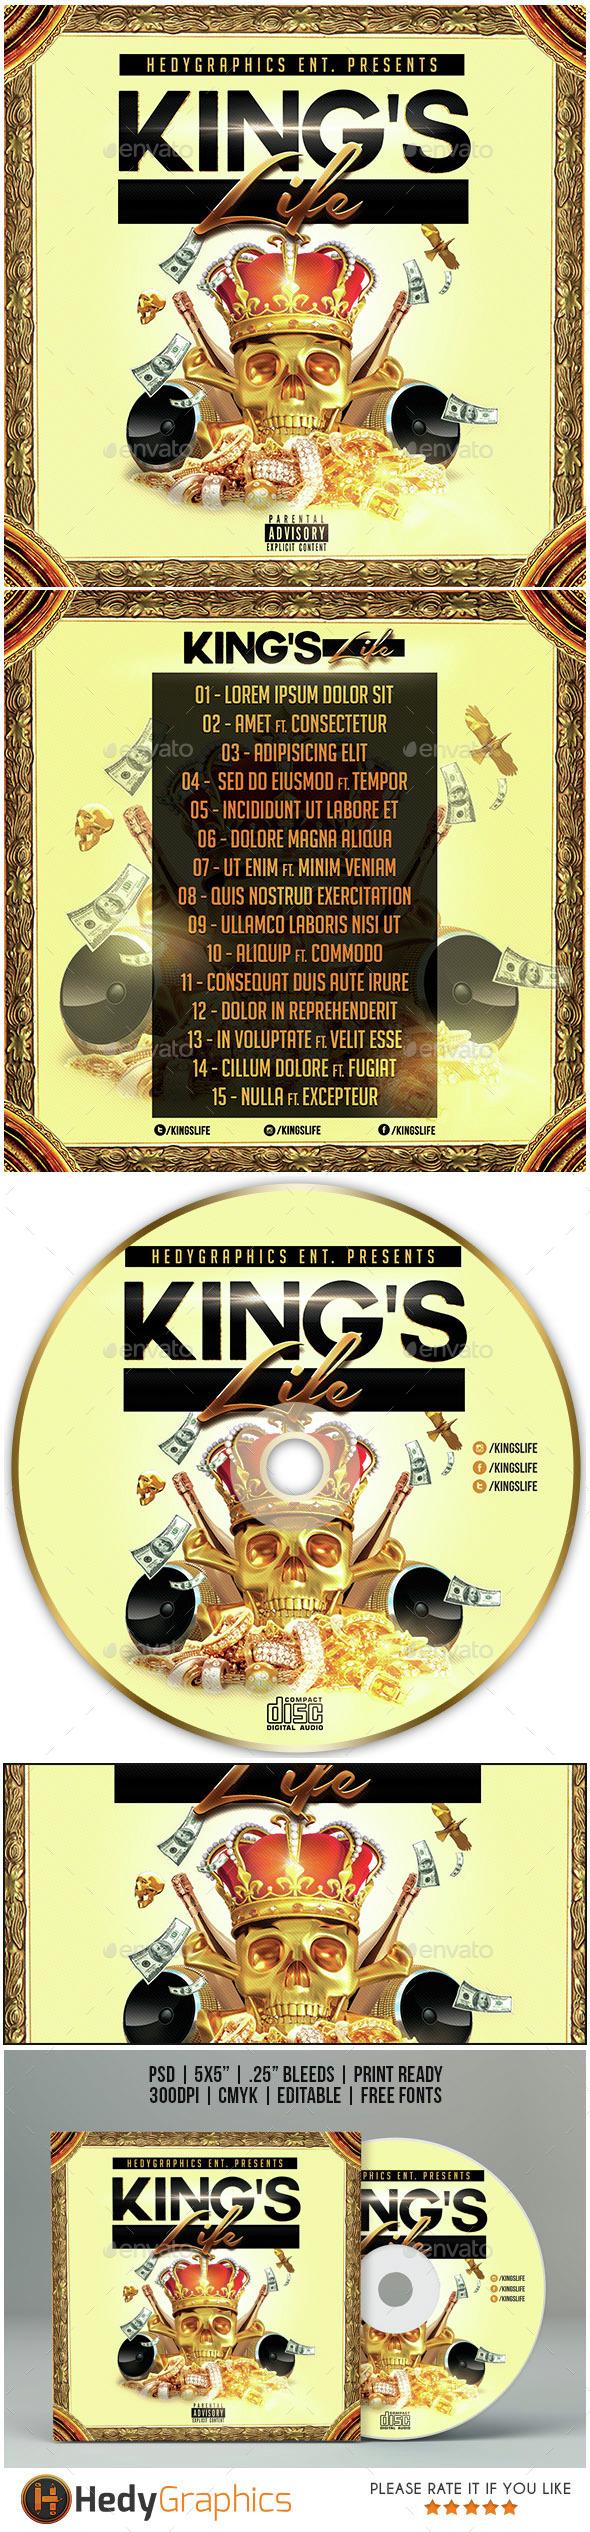 King's Life - Cd Cover Artwork - CD & DVD Artwork Print Templates